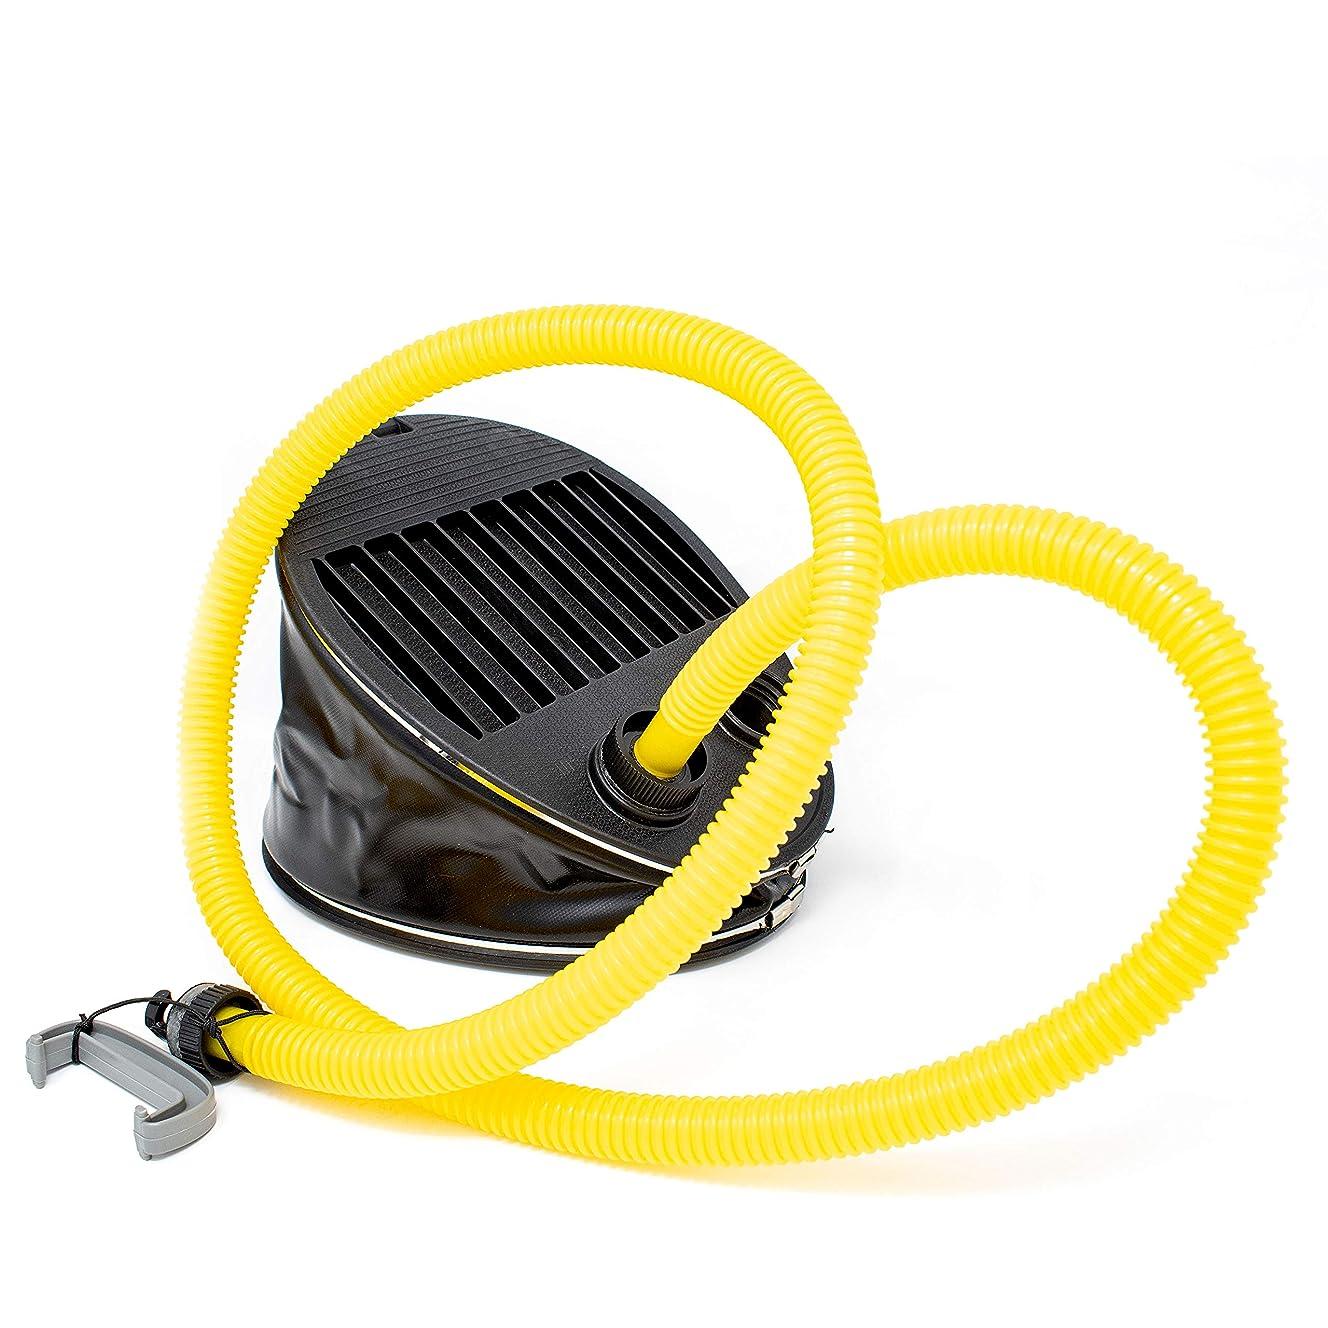 ALEKO BTPUMP High Pressure Foot Pump For Inflatable Boats And Camping Equipment